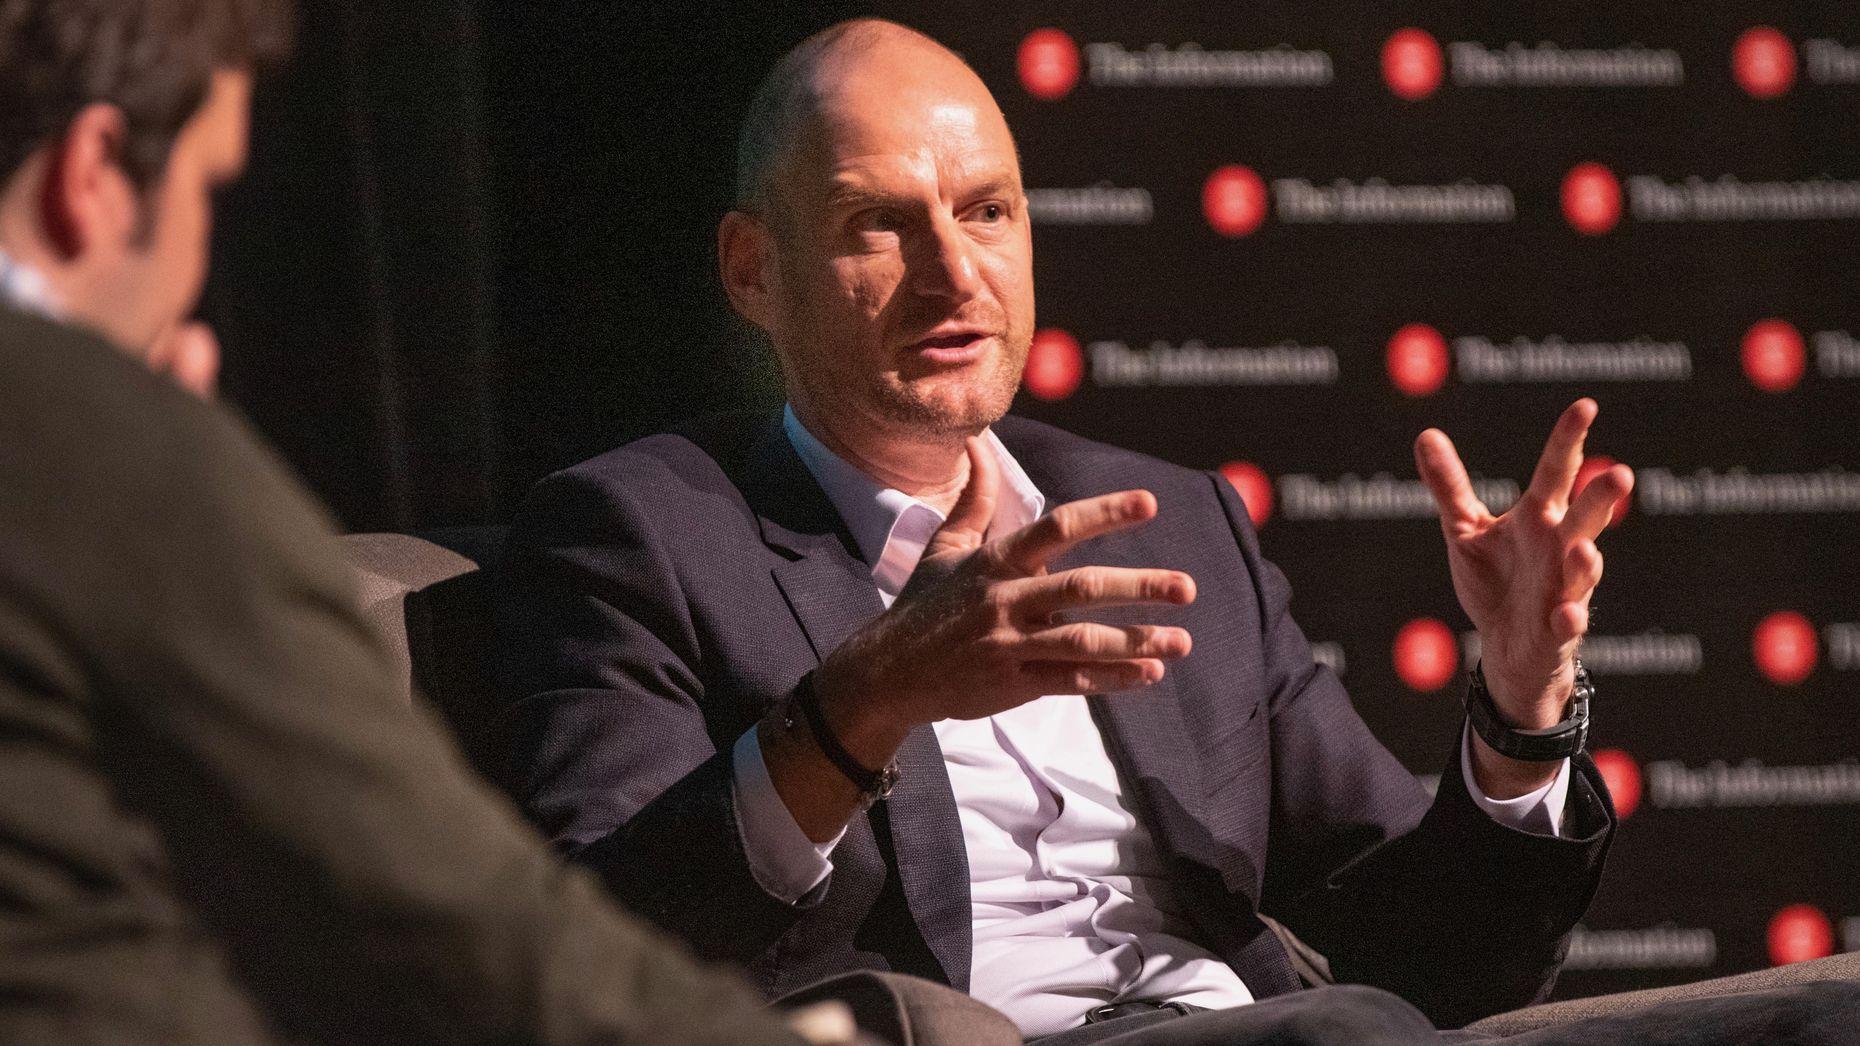 Softbank's Michael Ronen at The Information's Autonomous Vehicle Summit on Thursday. Photo by Erin Beach